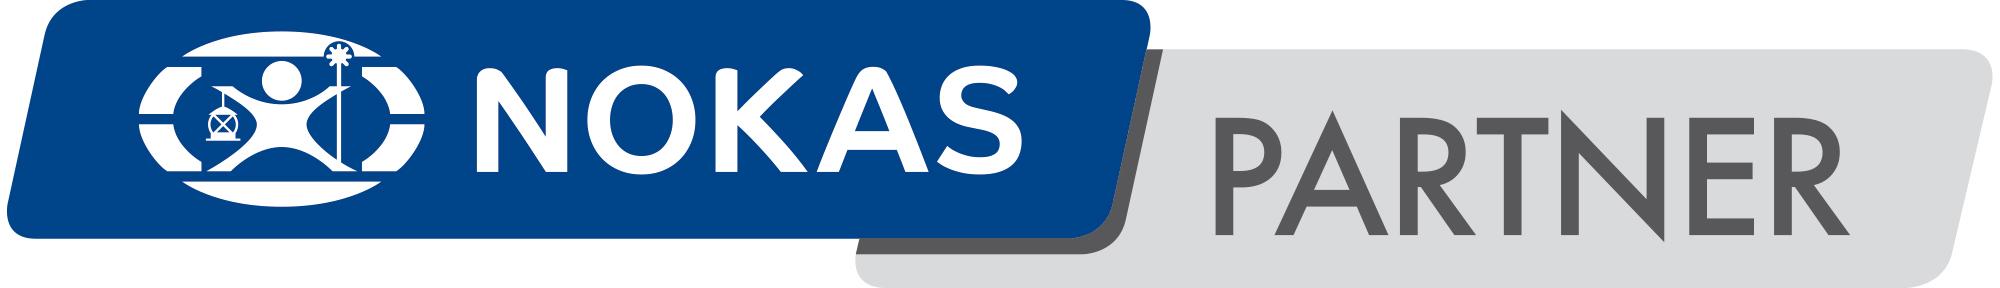 Nokas-Partner-logo-blaa